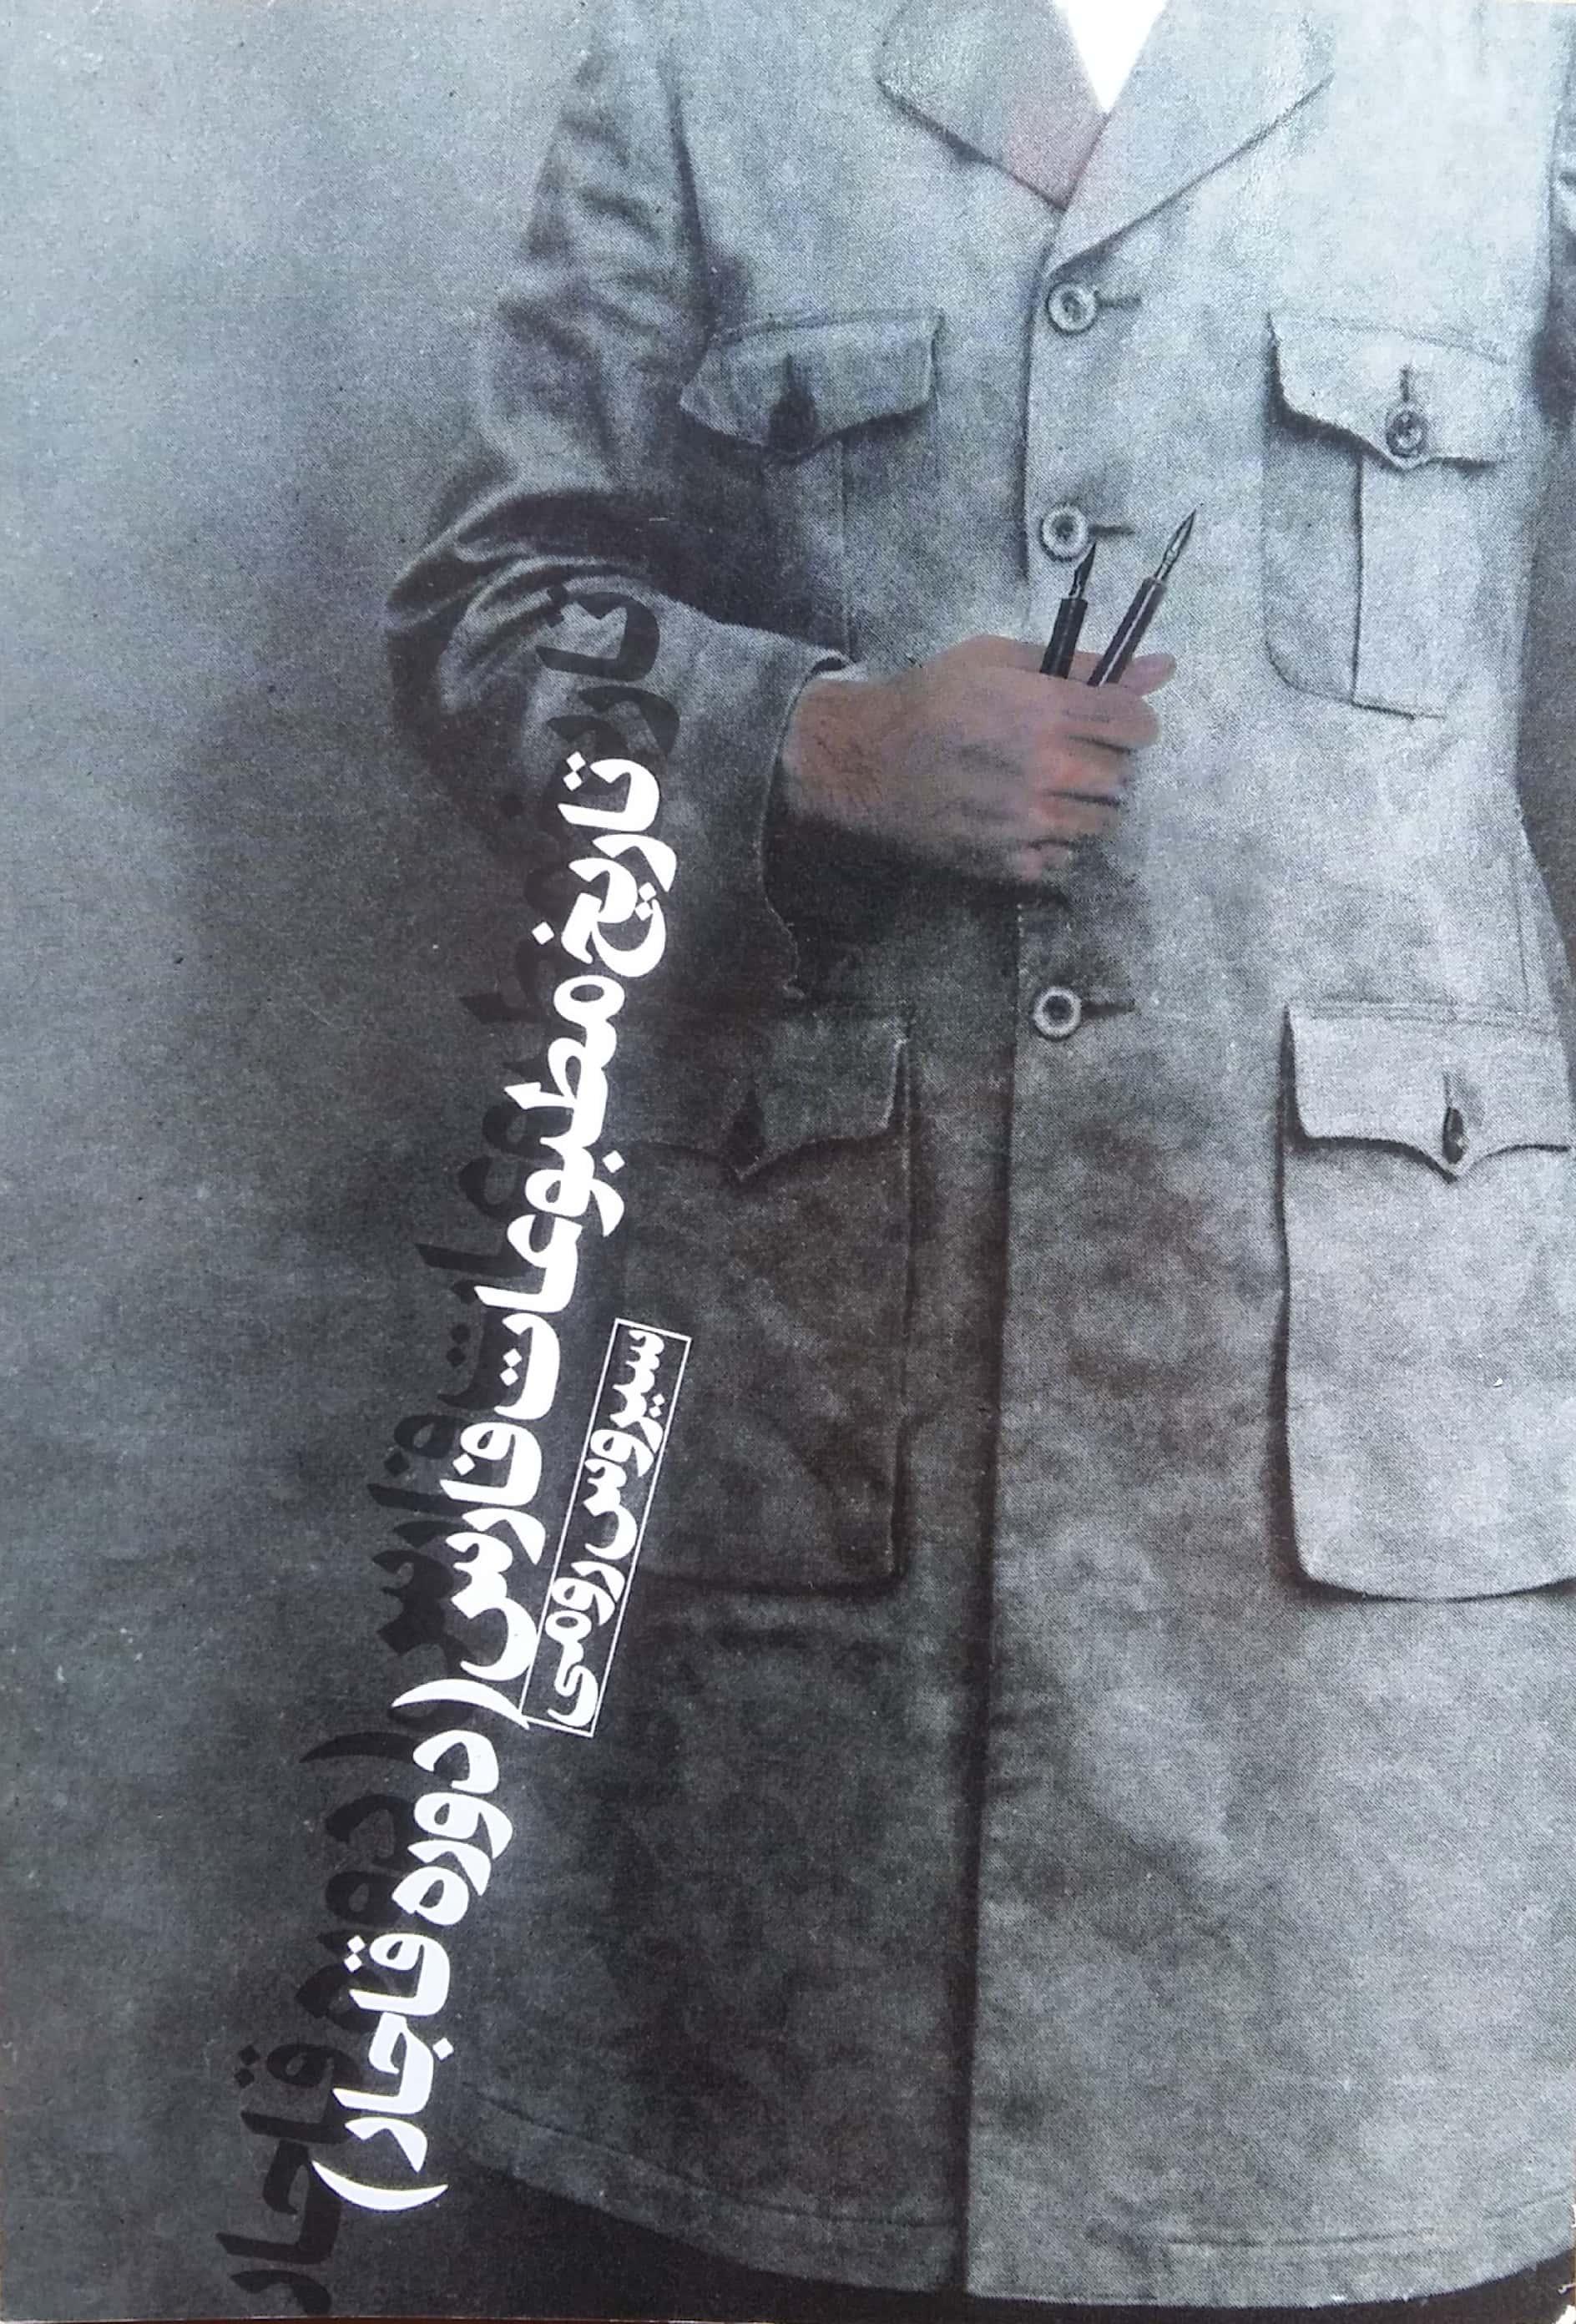 بنياد فارس شناسي تاریخ مطبوعات فارس (مولف سیروس رومی)